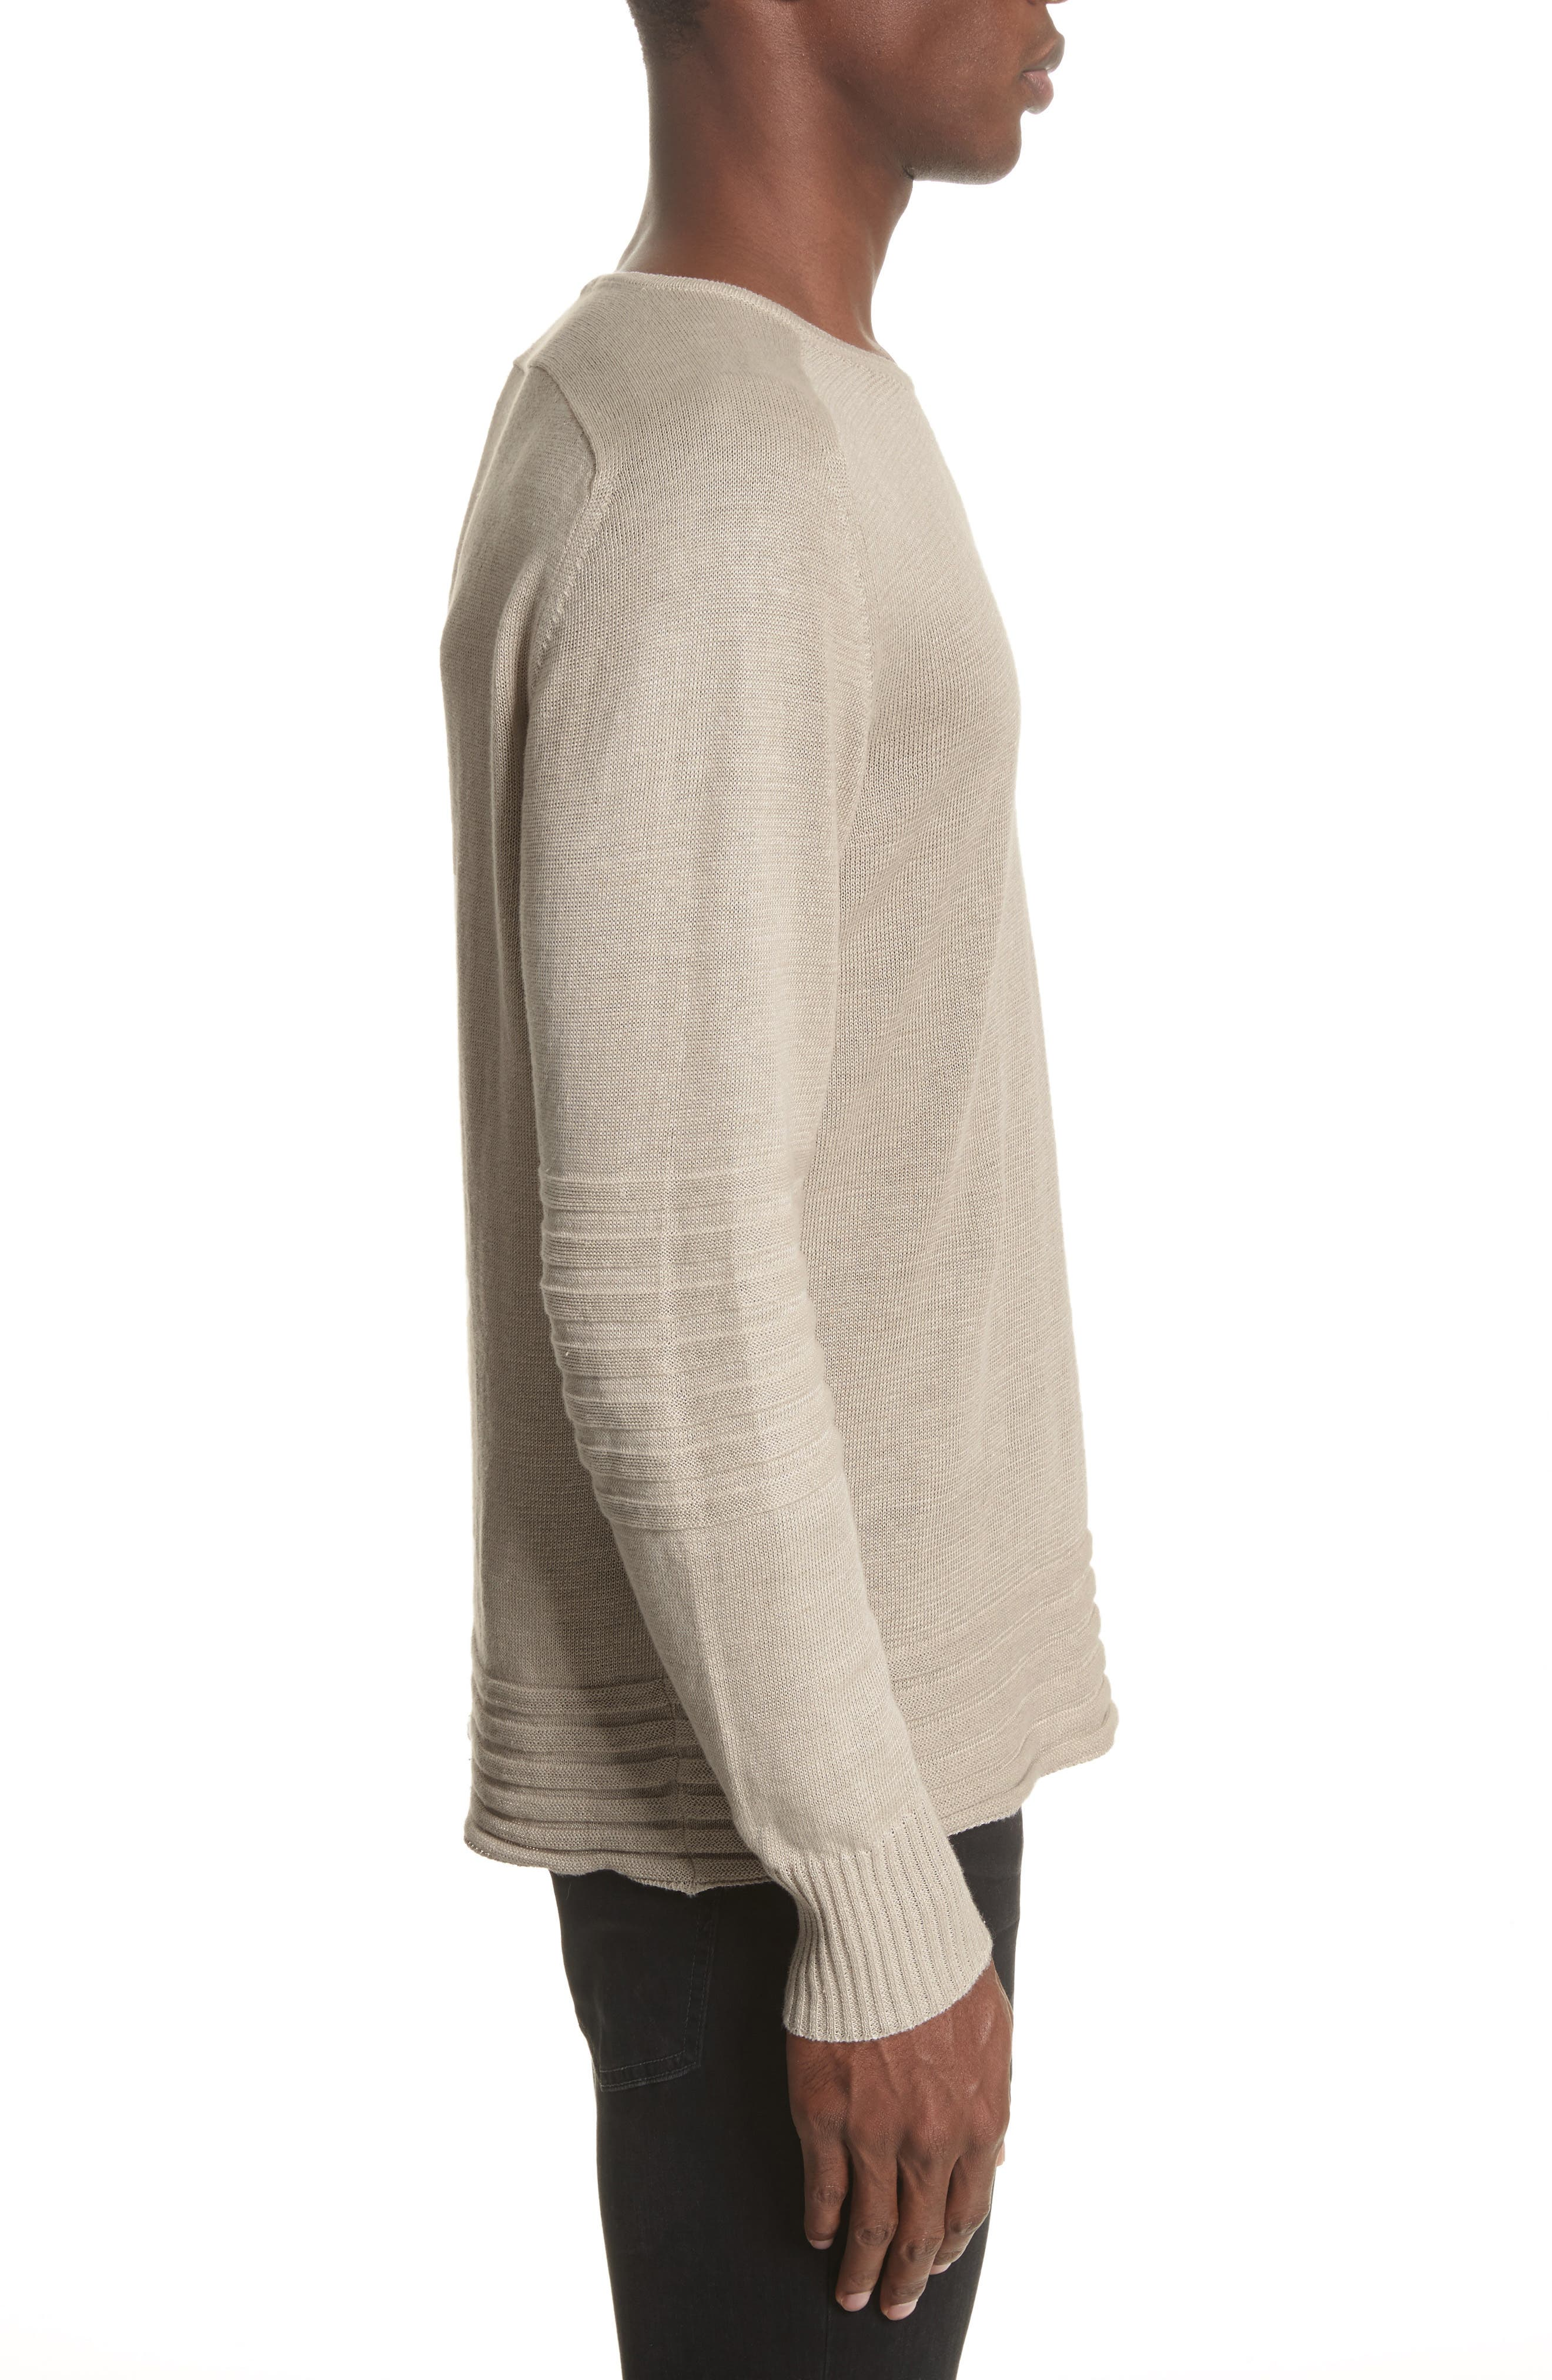 Exford Linen Crewneck Sweater,                             Alternate thumbnail 3, color,                             270